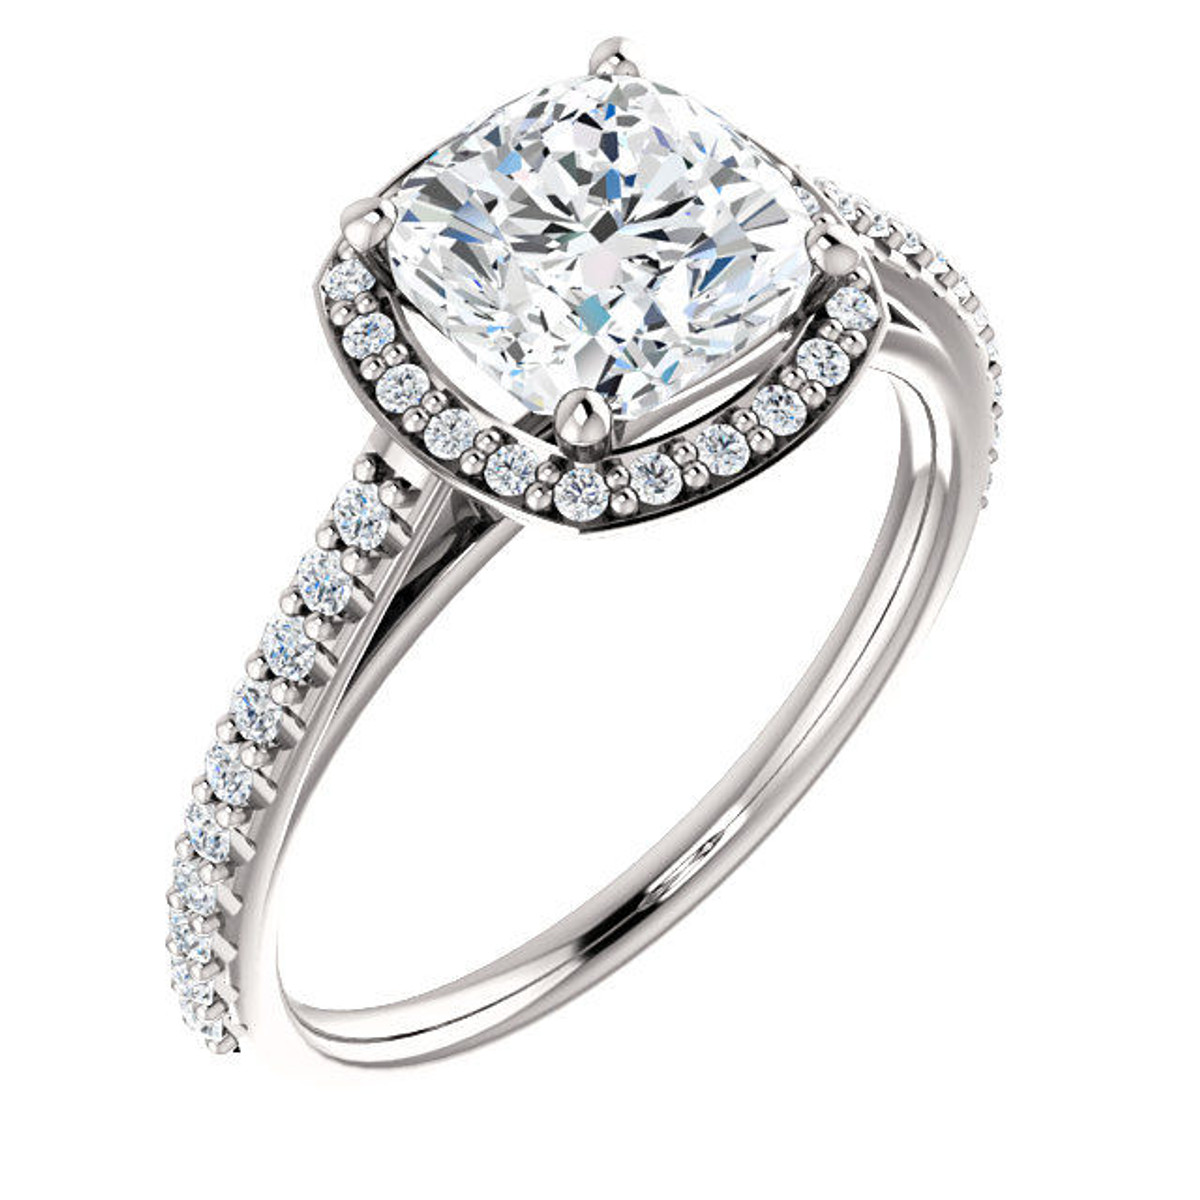 White Gold Cushion Cut Halo Engagement Ring